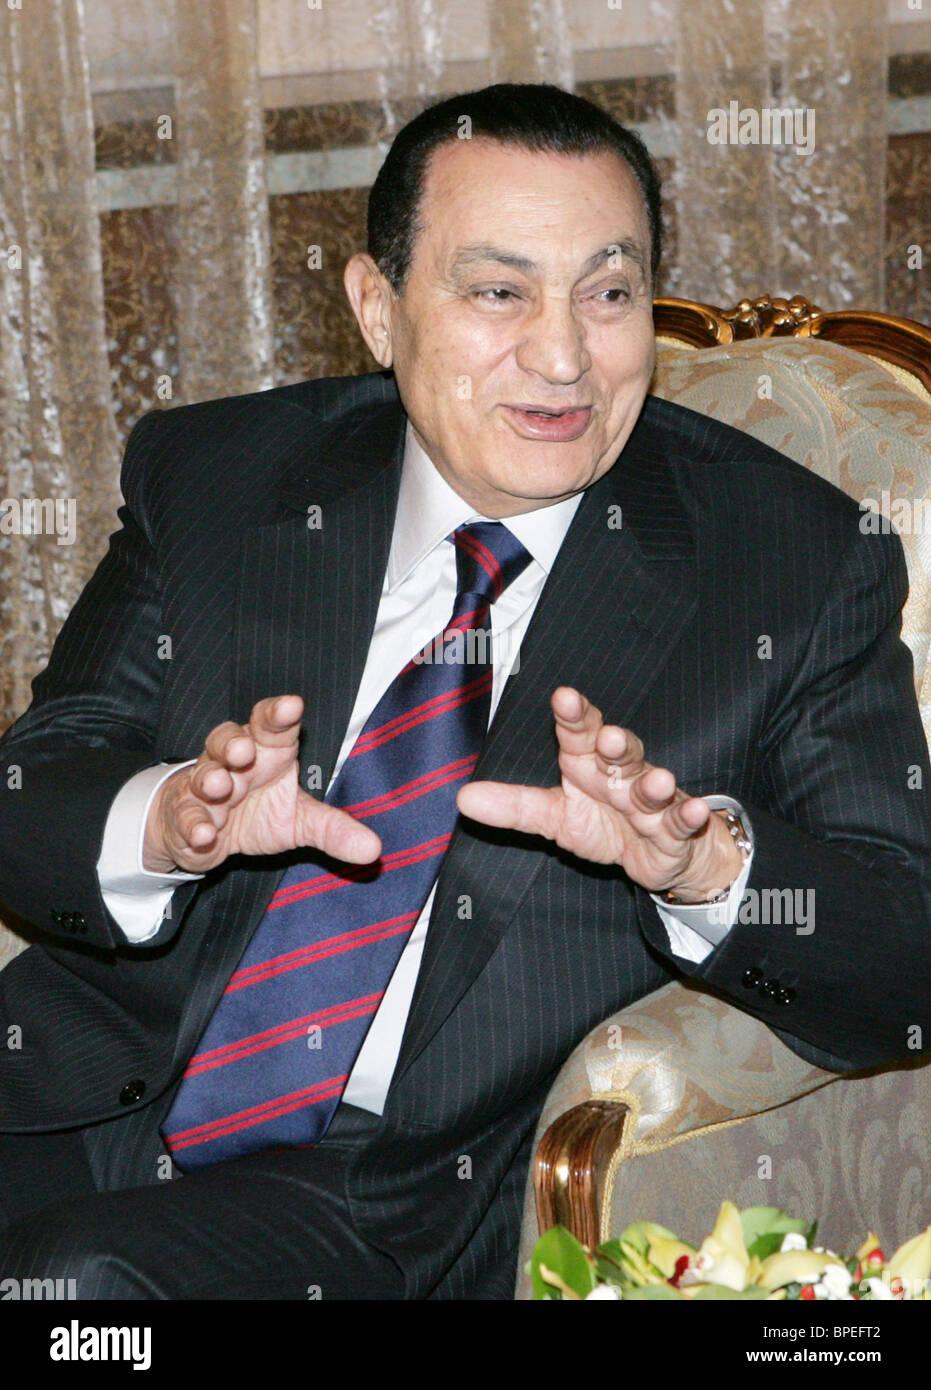 Vladimir Putin and Hosni Mubarak meet in Novo Ogaryovo - Stock Image